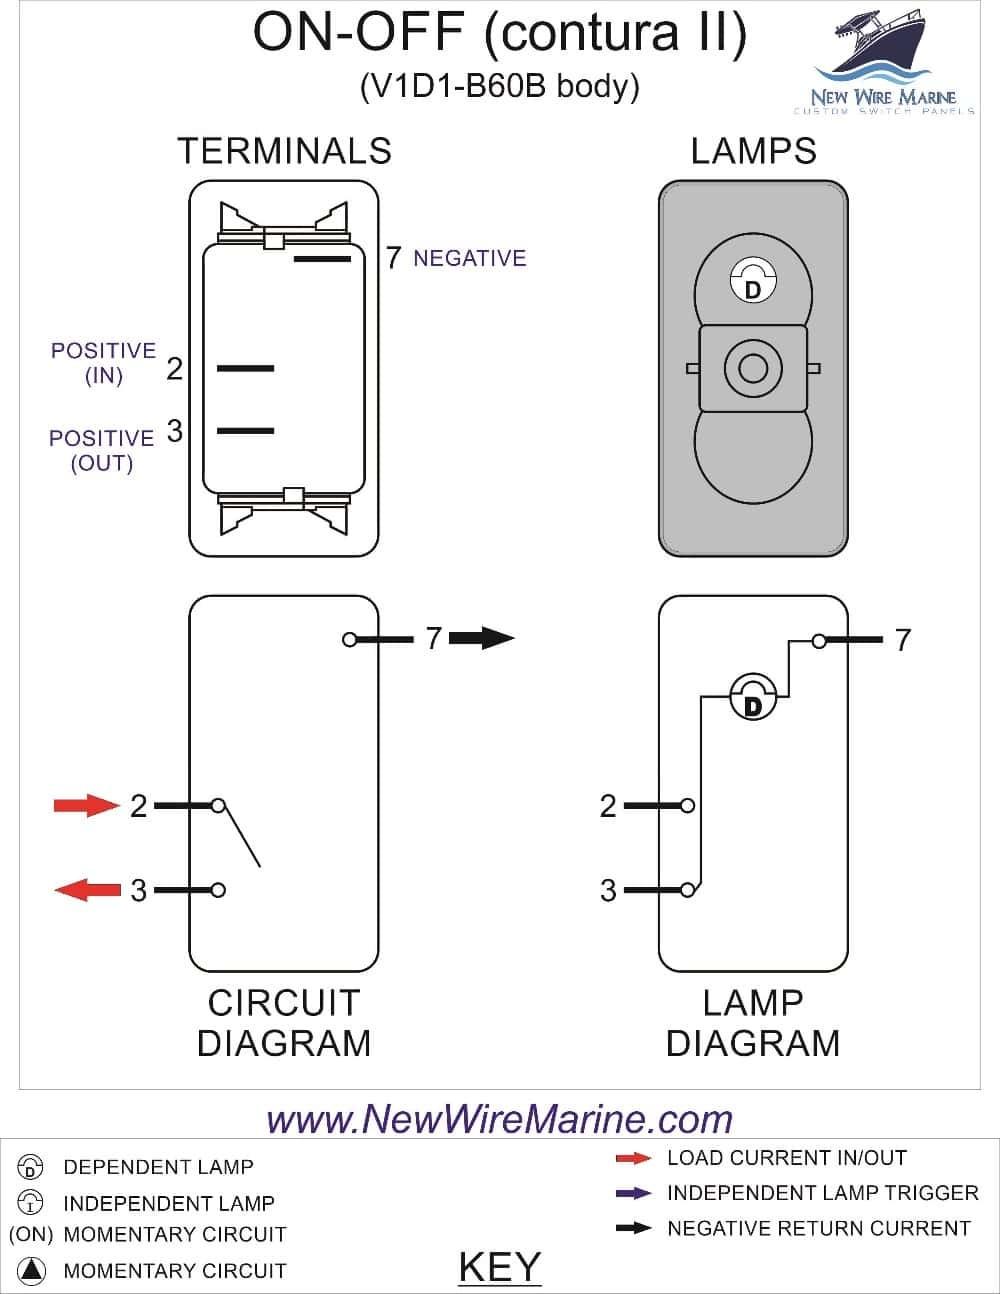 illuminated rocker switch wiring diagram awesome wiring diagram image rh mainetreasurechest com carling lighted rocker switch wiring lighted rocker switch wiring diagram 120v